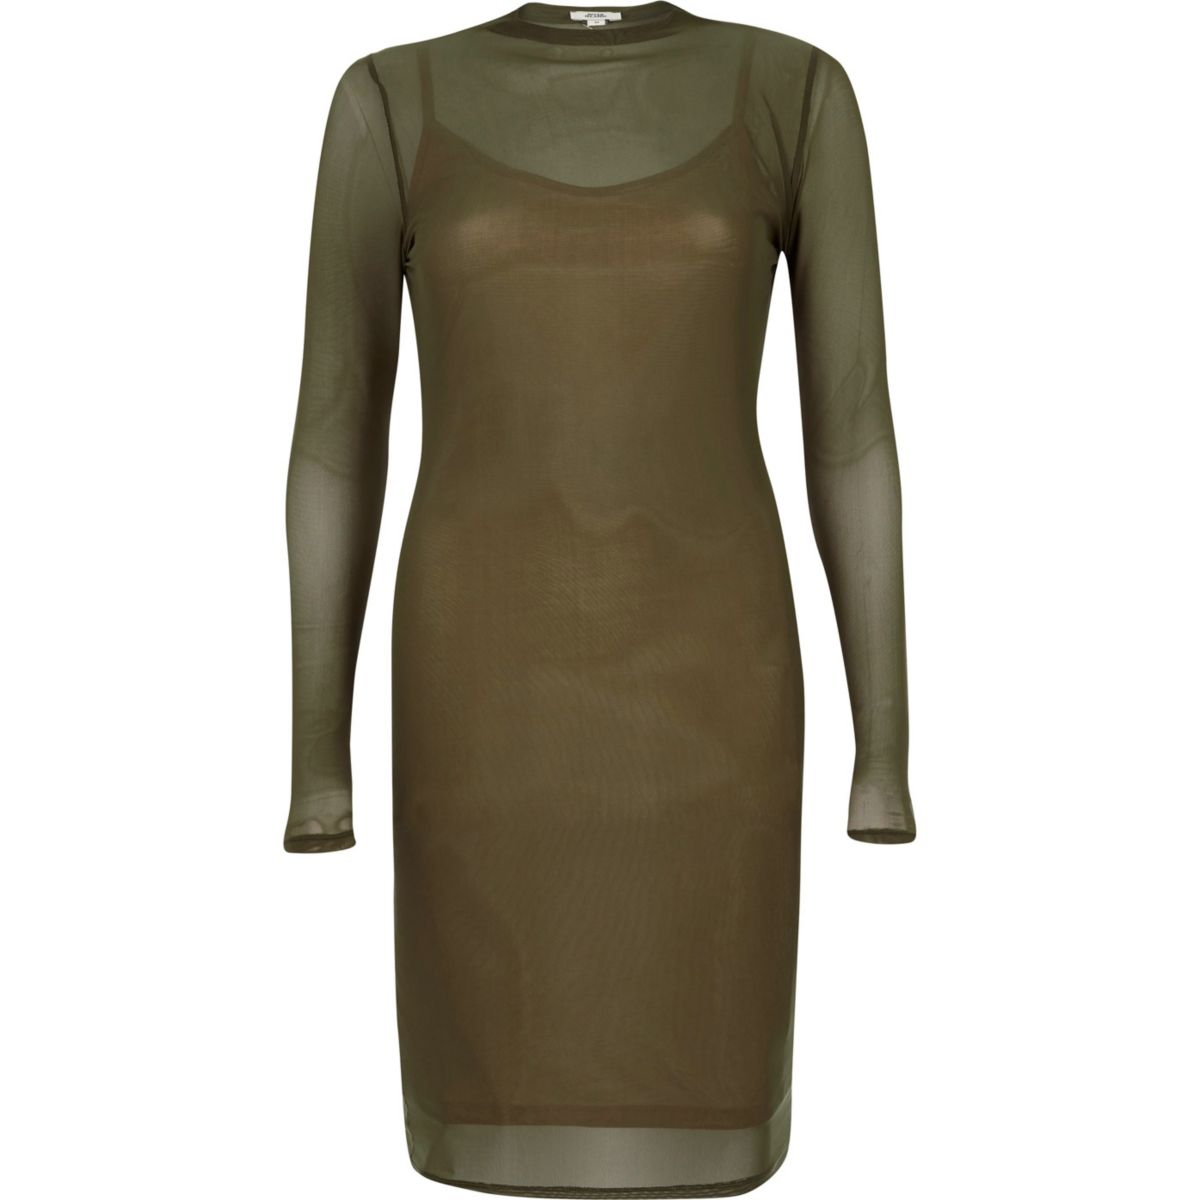 Khaki green mesh long sleeve bodycon dress